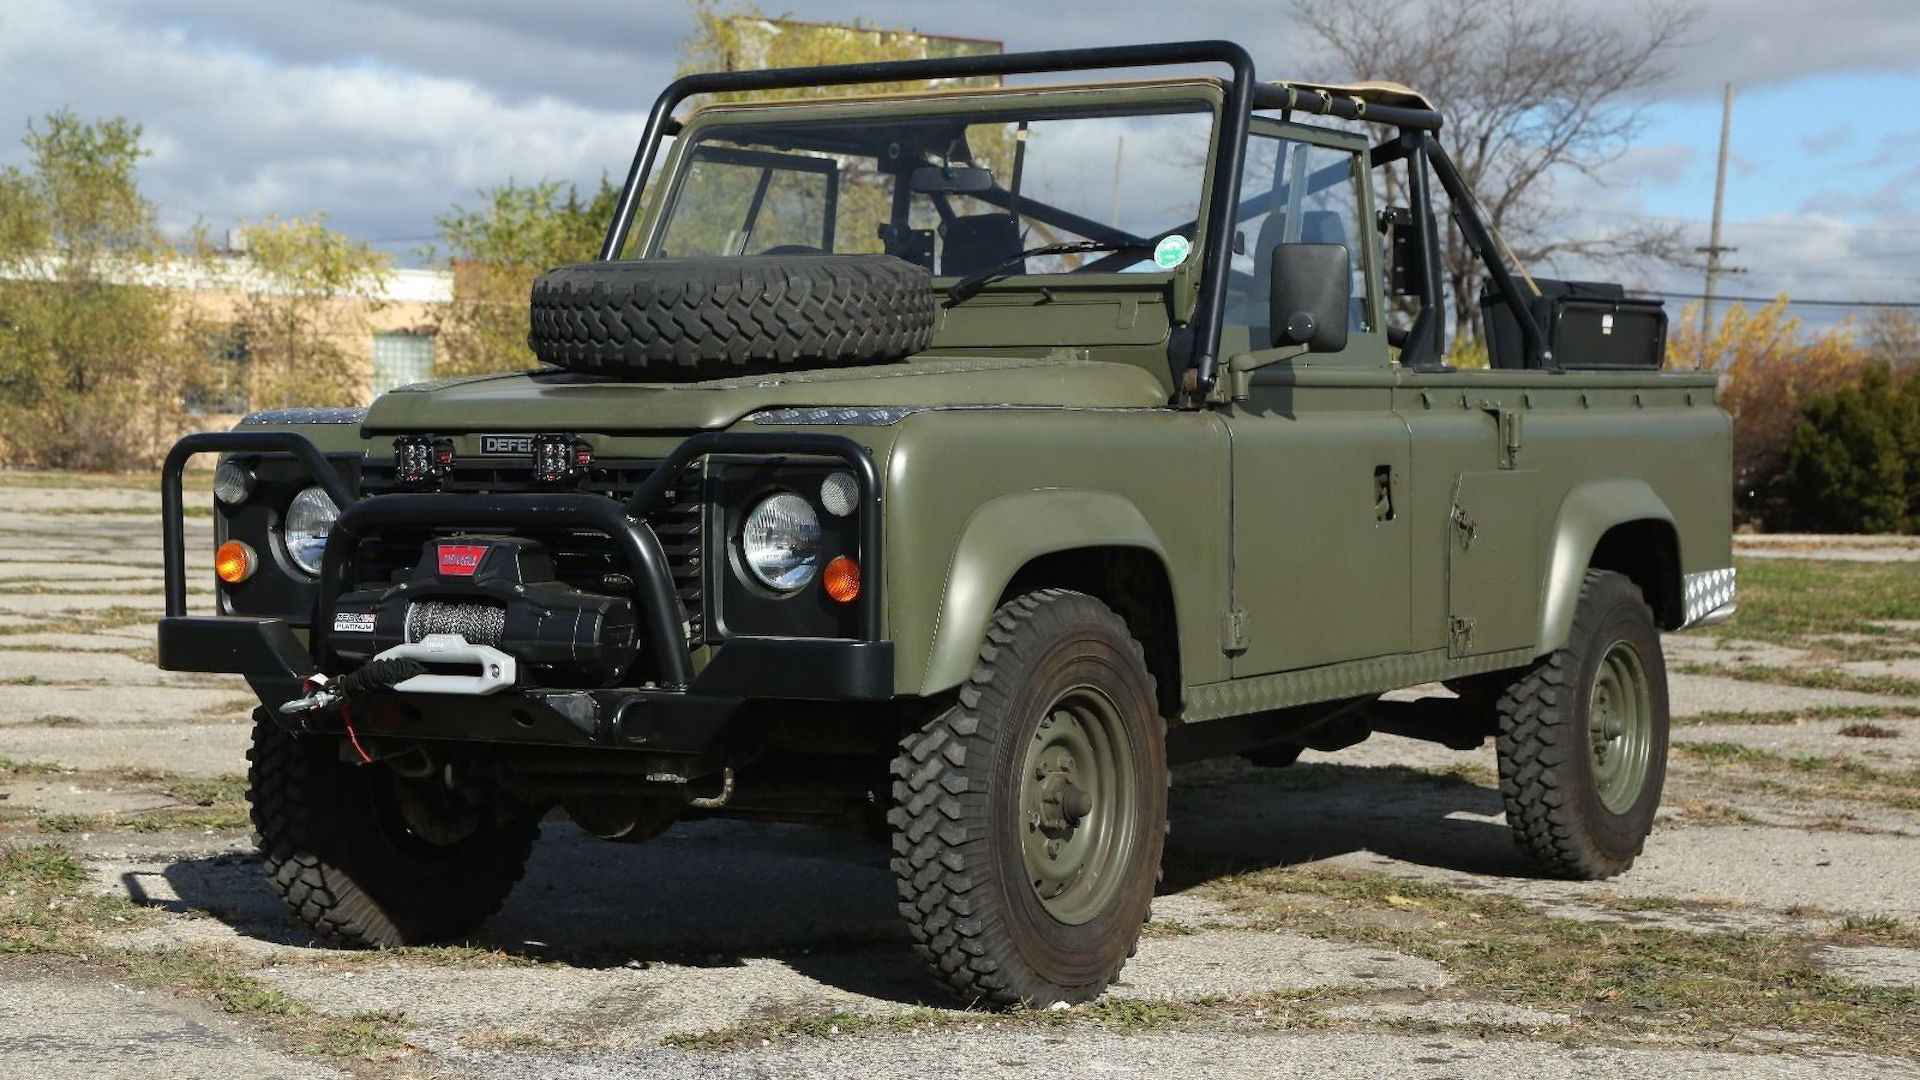 vehicle rover defender land arkonik fullsizeoutput rapide edition by hunting